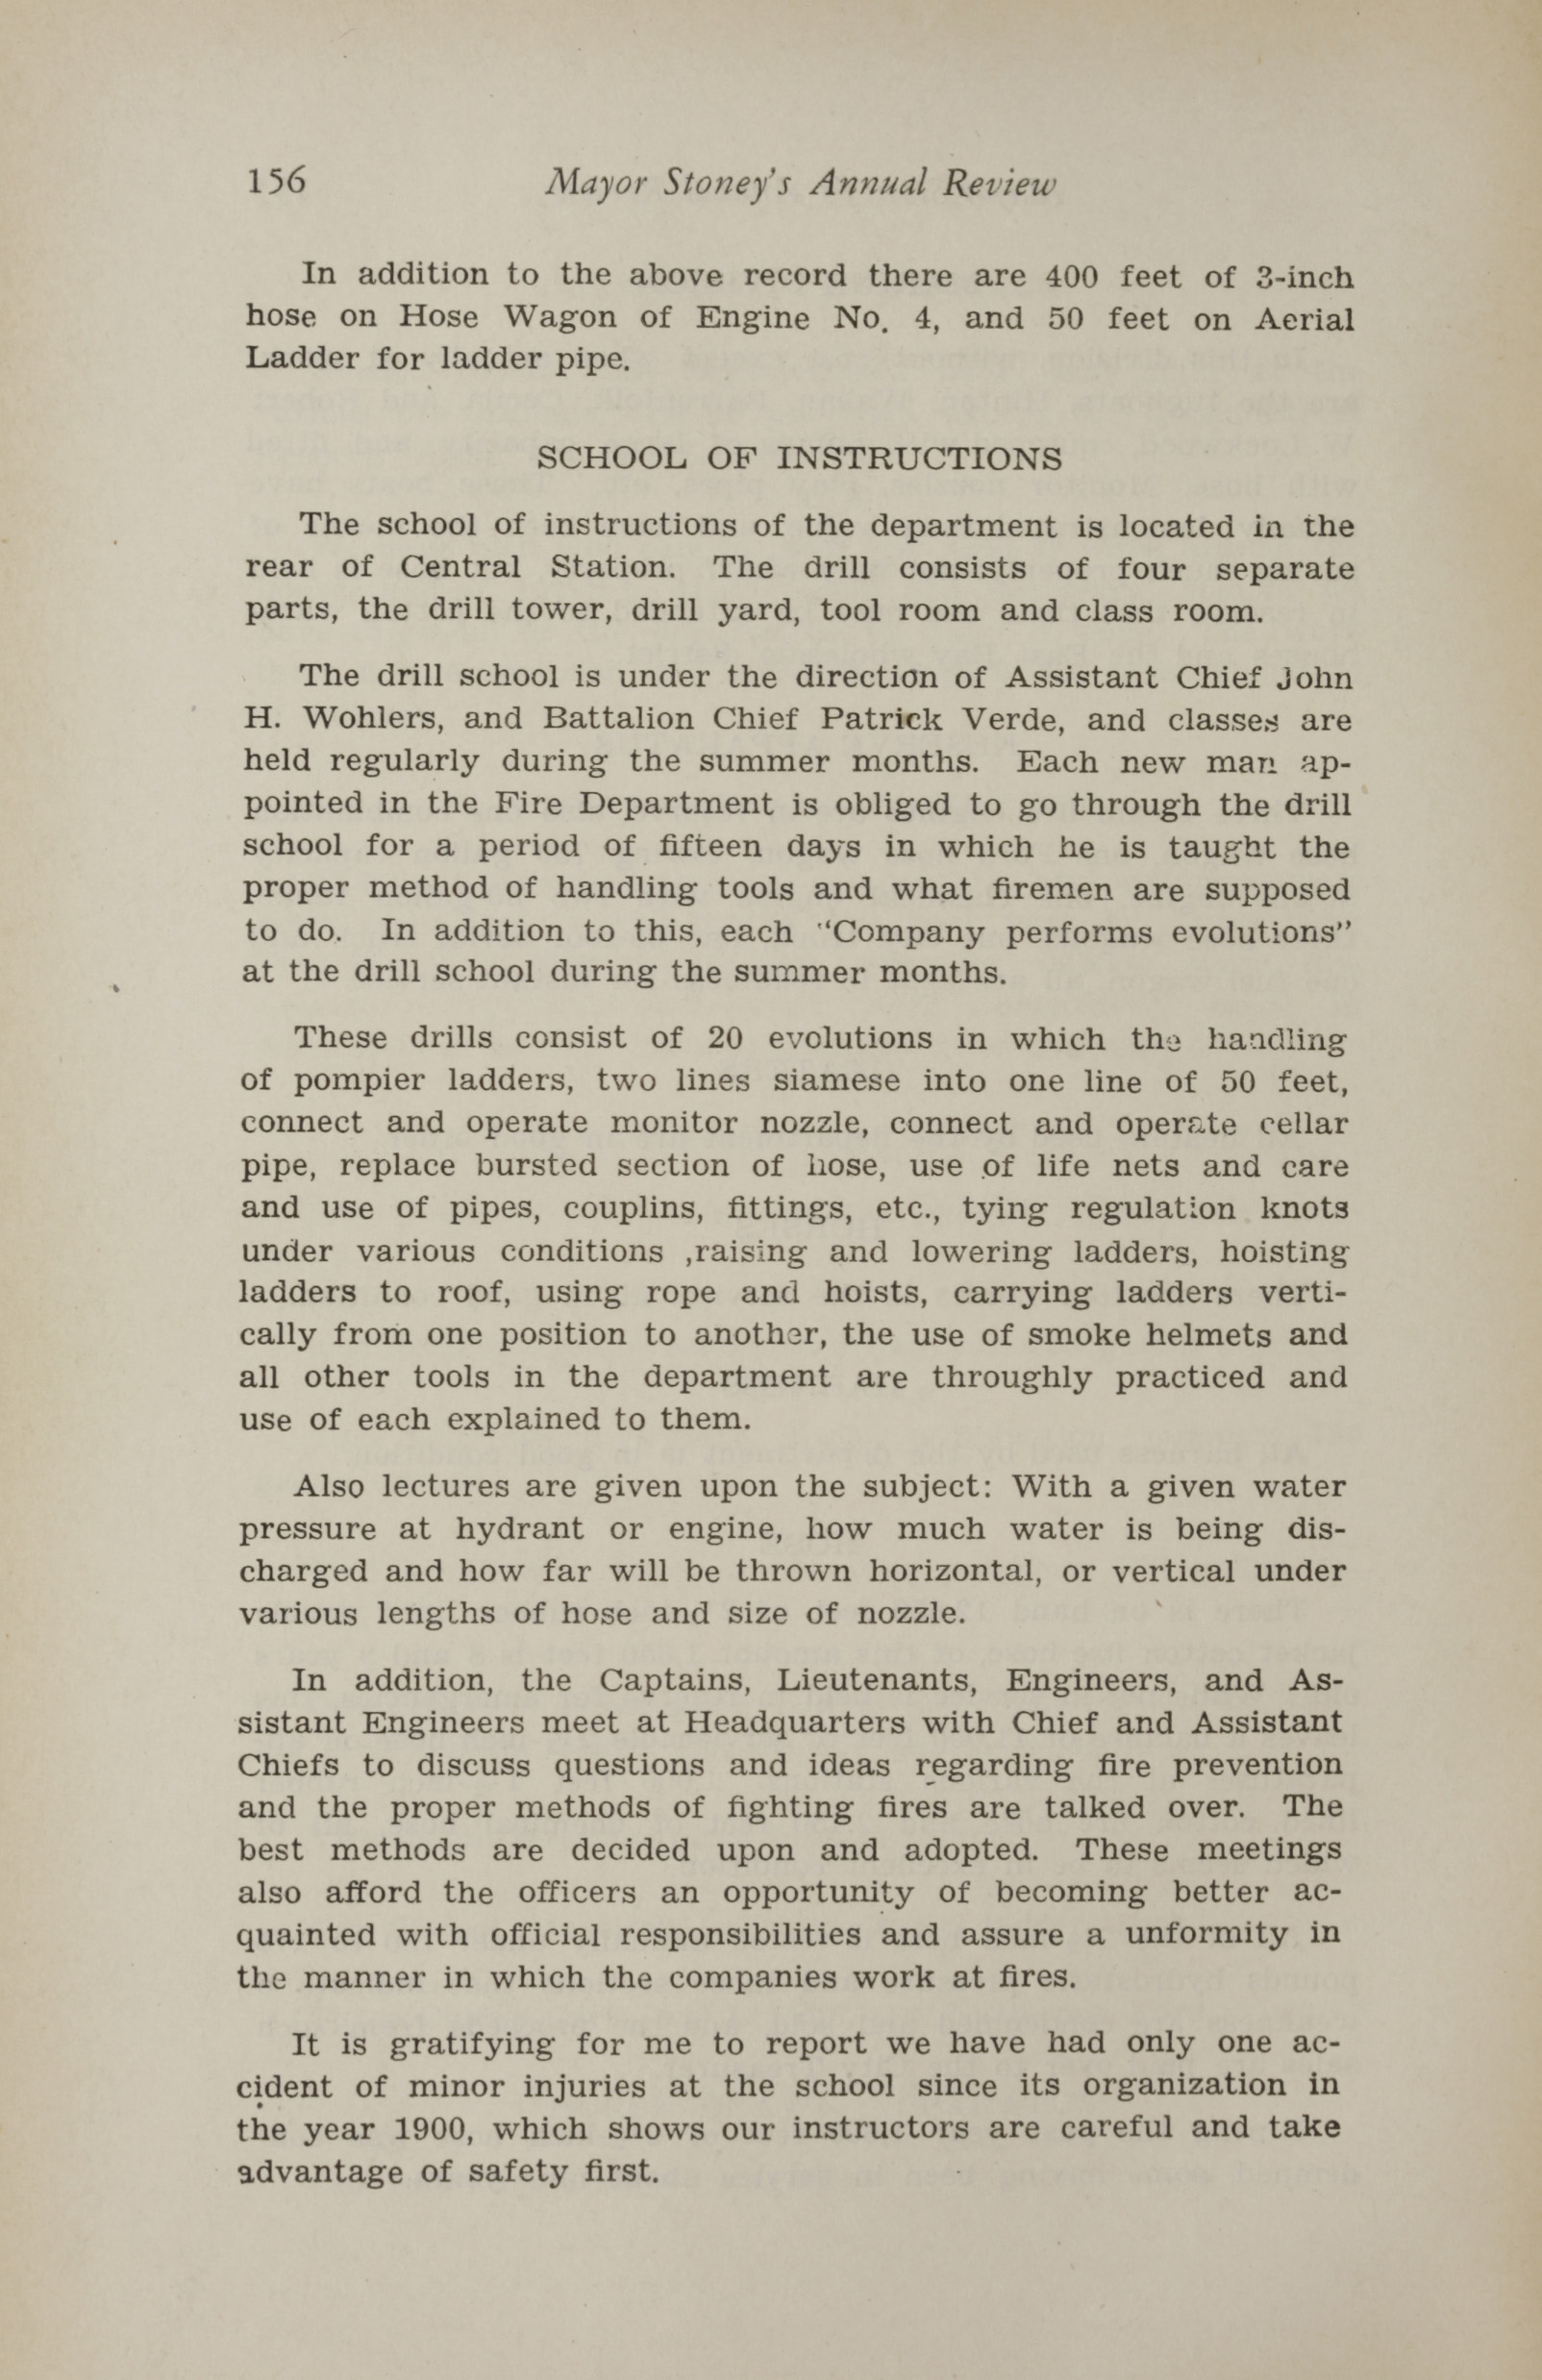 Charleston Yearbook, 1930, page 156